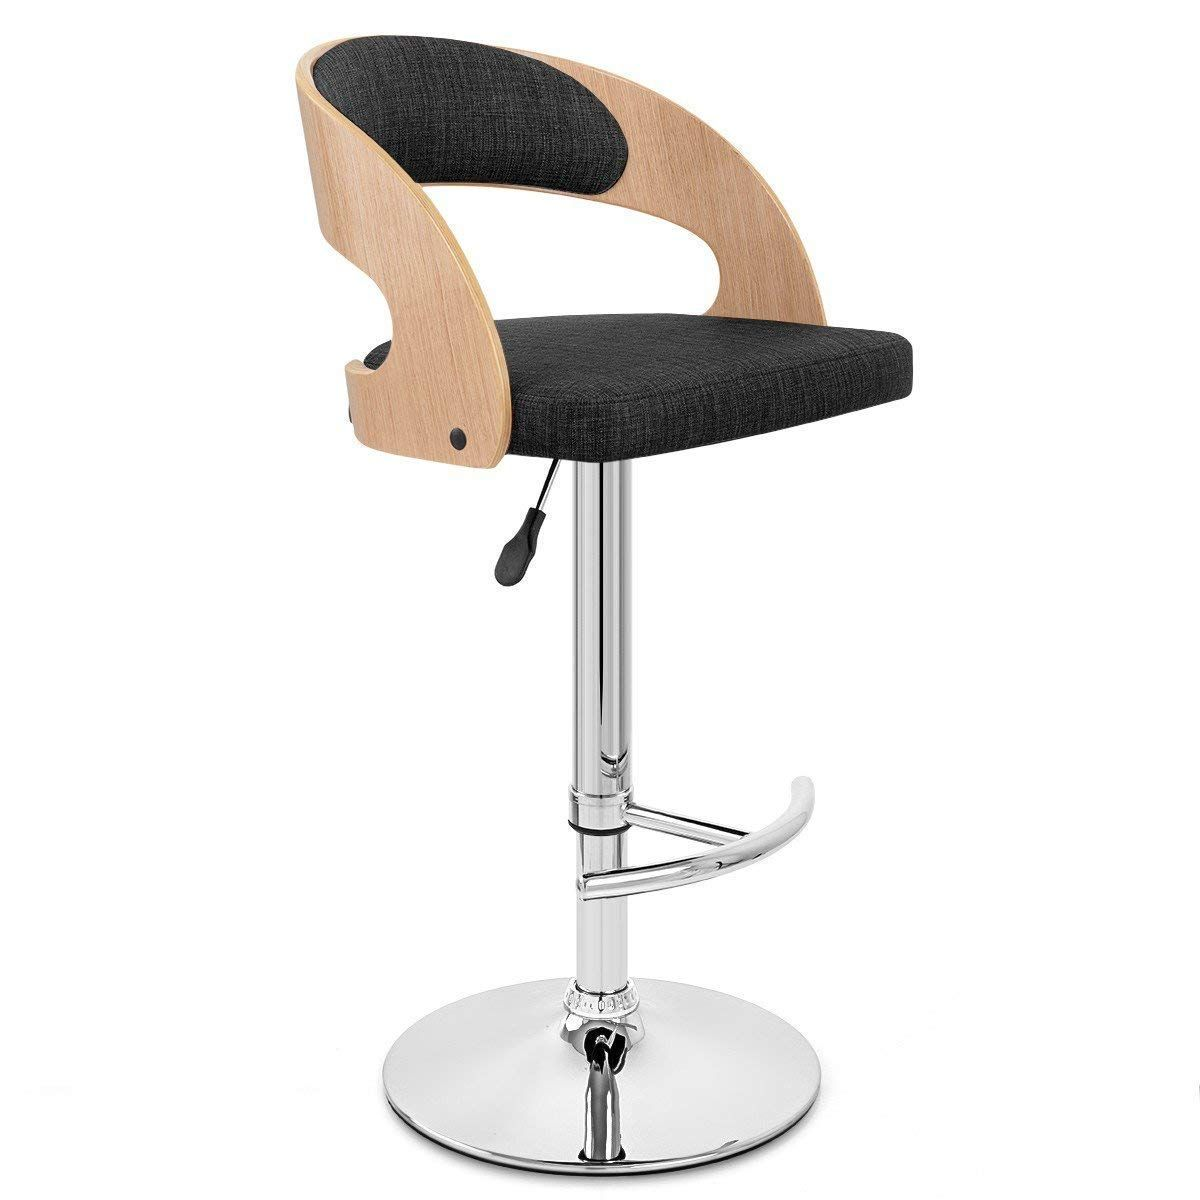 Chuan Han Bar Stool Bar Chair Adjustable Rotating Gas Lift Chrome Footstool Stool Adjustable Height 5 Adjustable Bar Stools Swivel Bar Stools Bar Stool Chairs